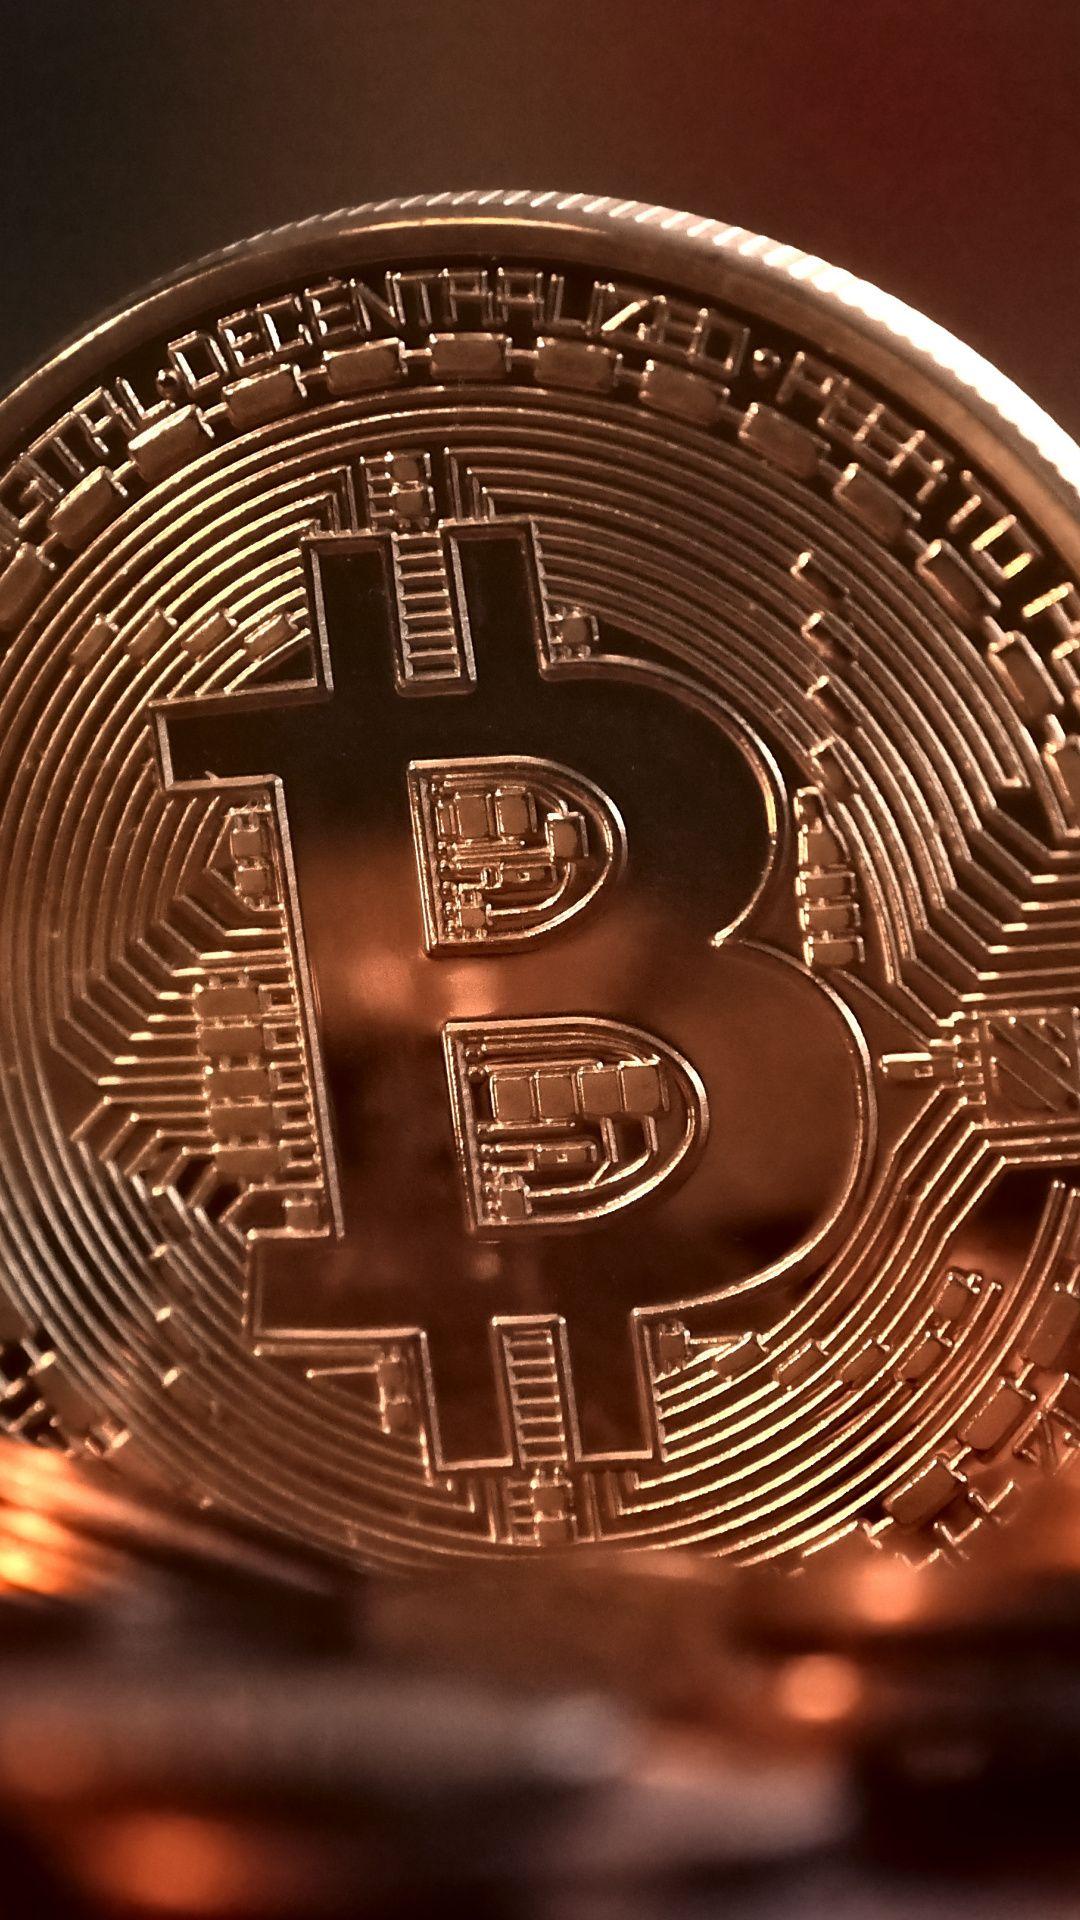 btc a usdt exchange perché dovrei comprare bitcoin